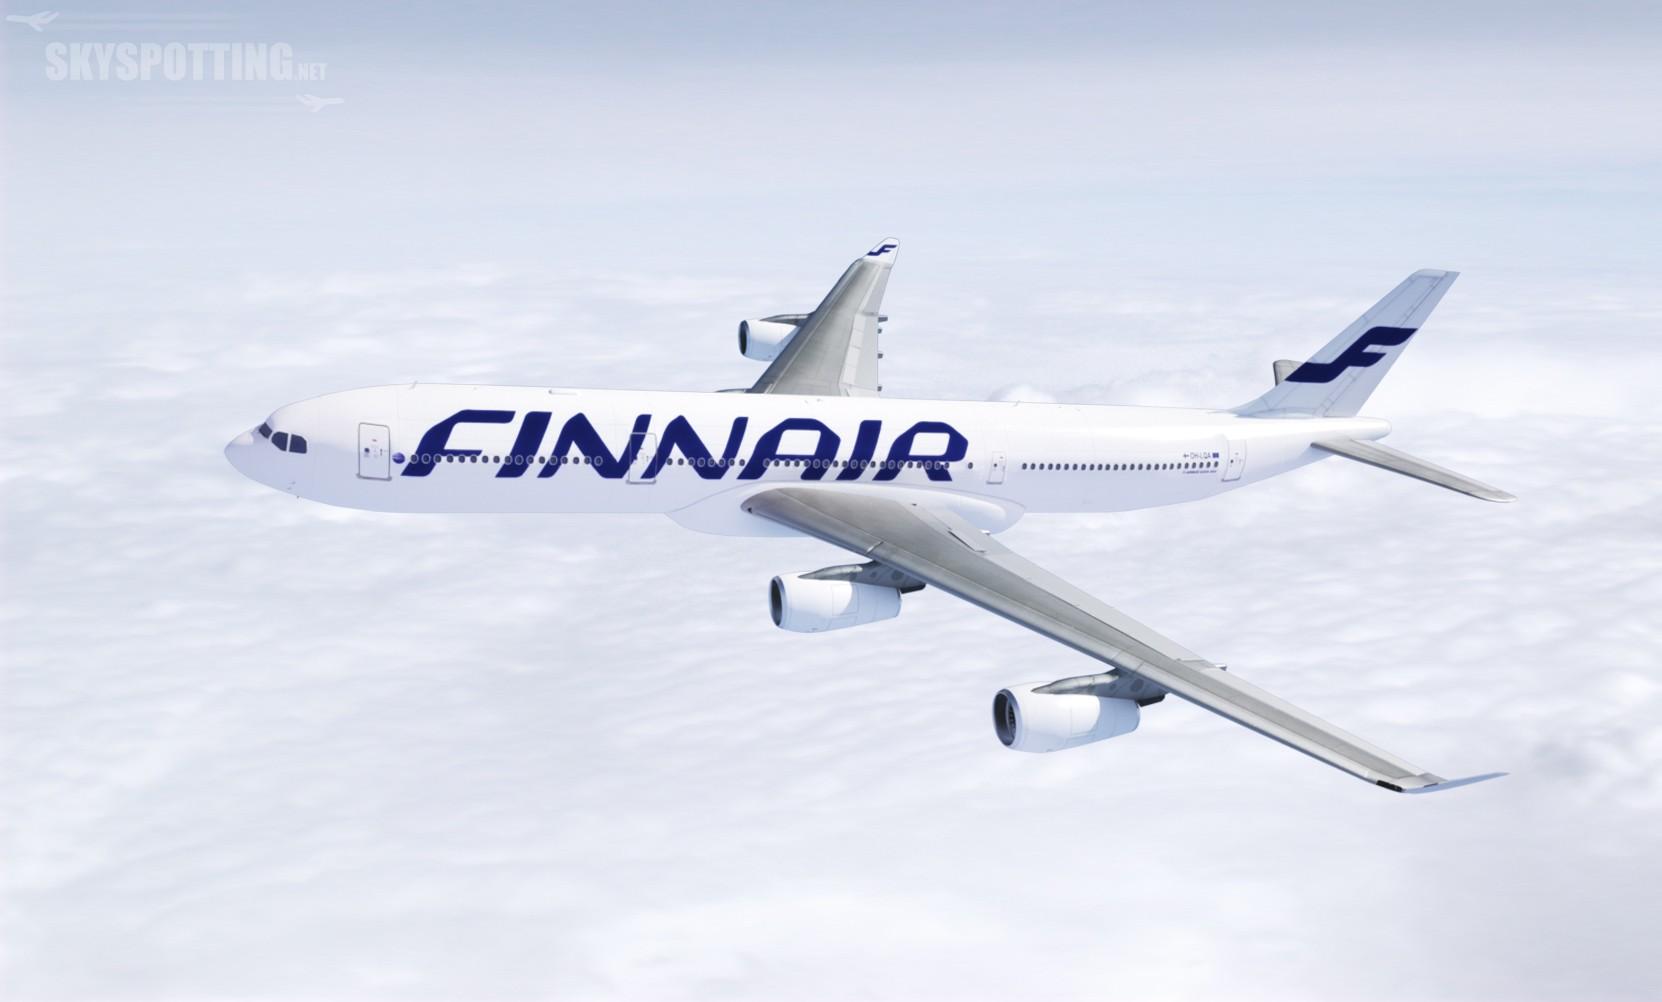 Finnair uruchamia regularne rejsy do Phuket i Krabi w Tajlandii